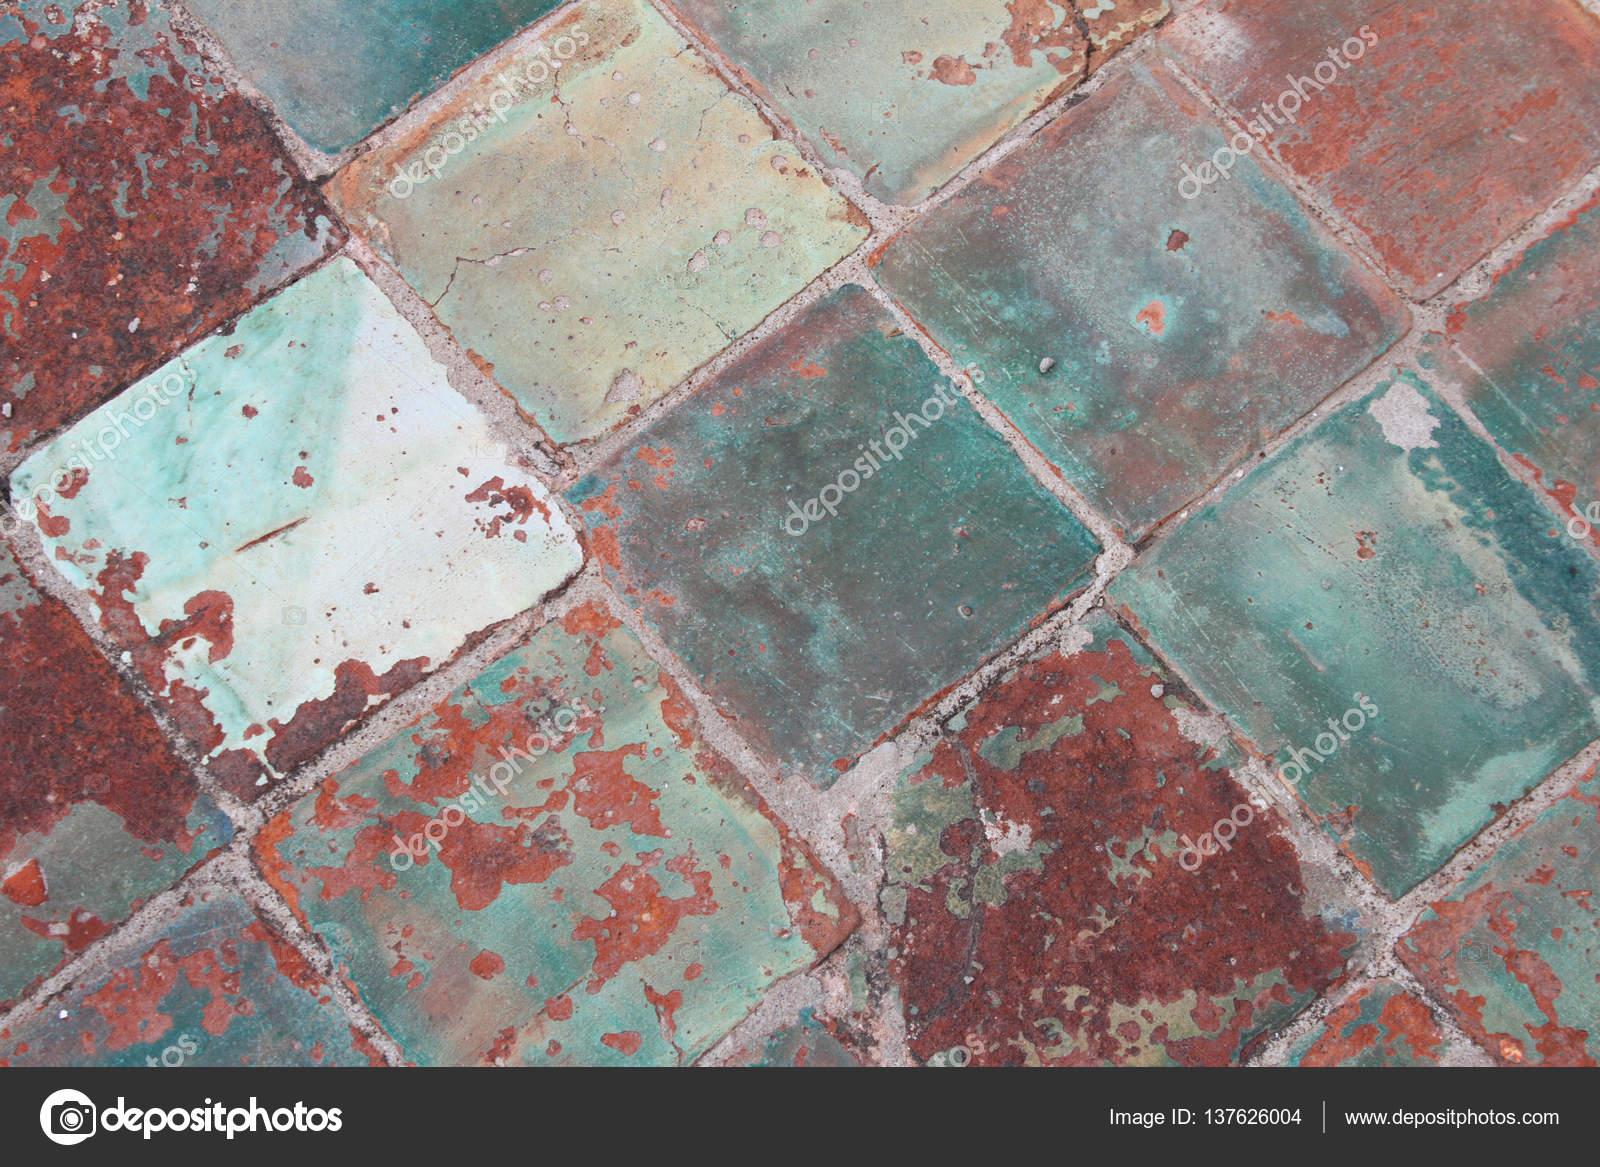 Awesome 12X12 Floor Tile Patterns Huge 12X24 Ceramic Floor Tile Shaped 12X24 Slate Tile Flooring 2 X 12 Ceramic Tile Young 2 X 8 Glass Subway Tile Blue2X4 Ceiling Tiles Home Depot Antique Green Ceramic Floor Tiles \u2014 Stock Photo © Jmillard37 #137626004